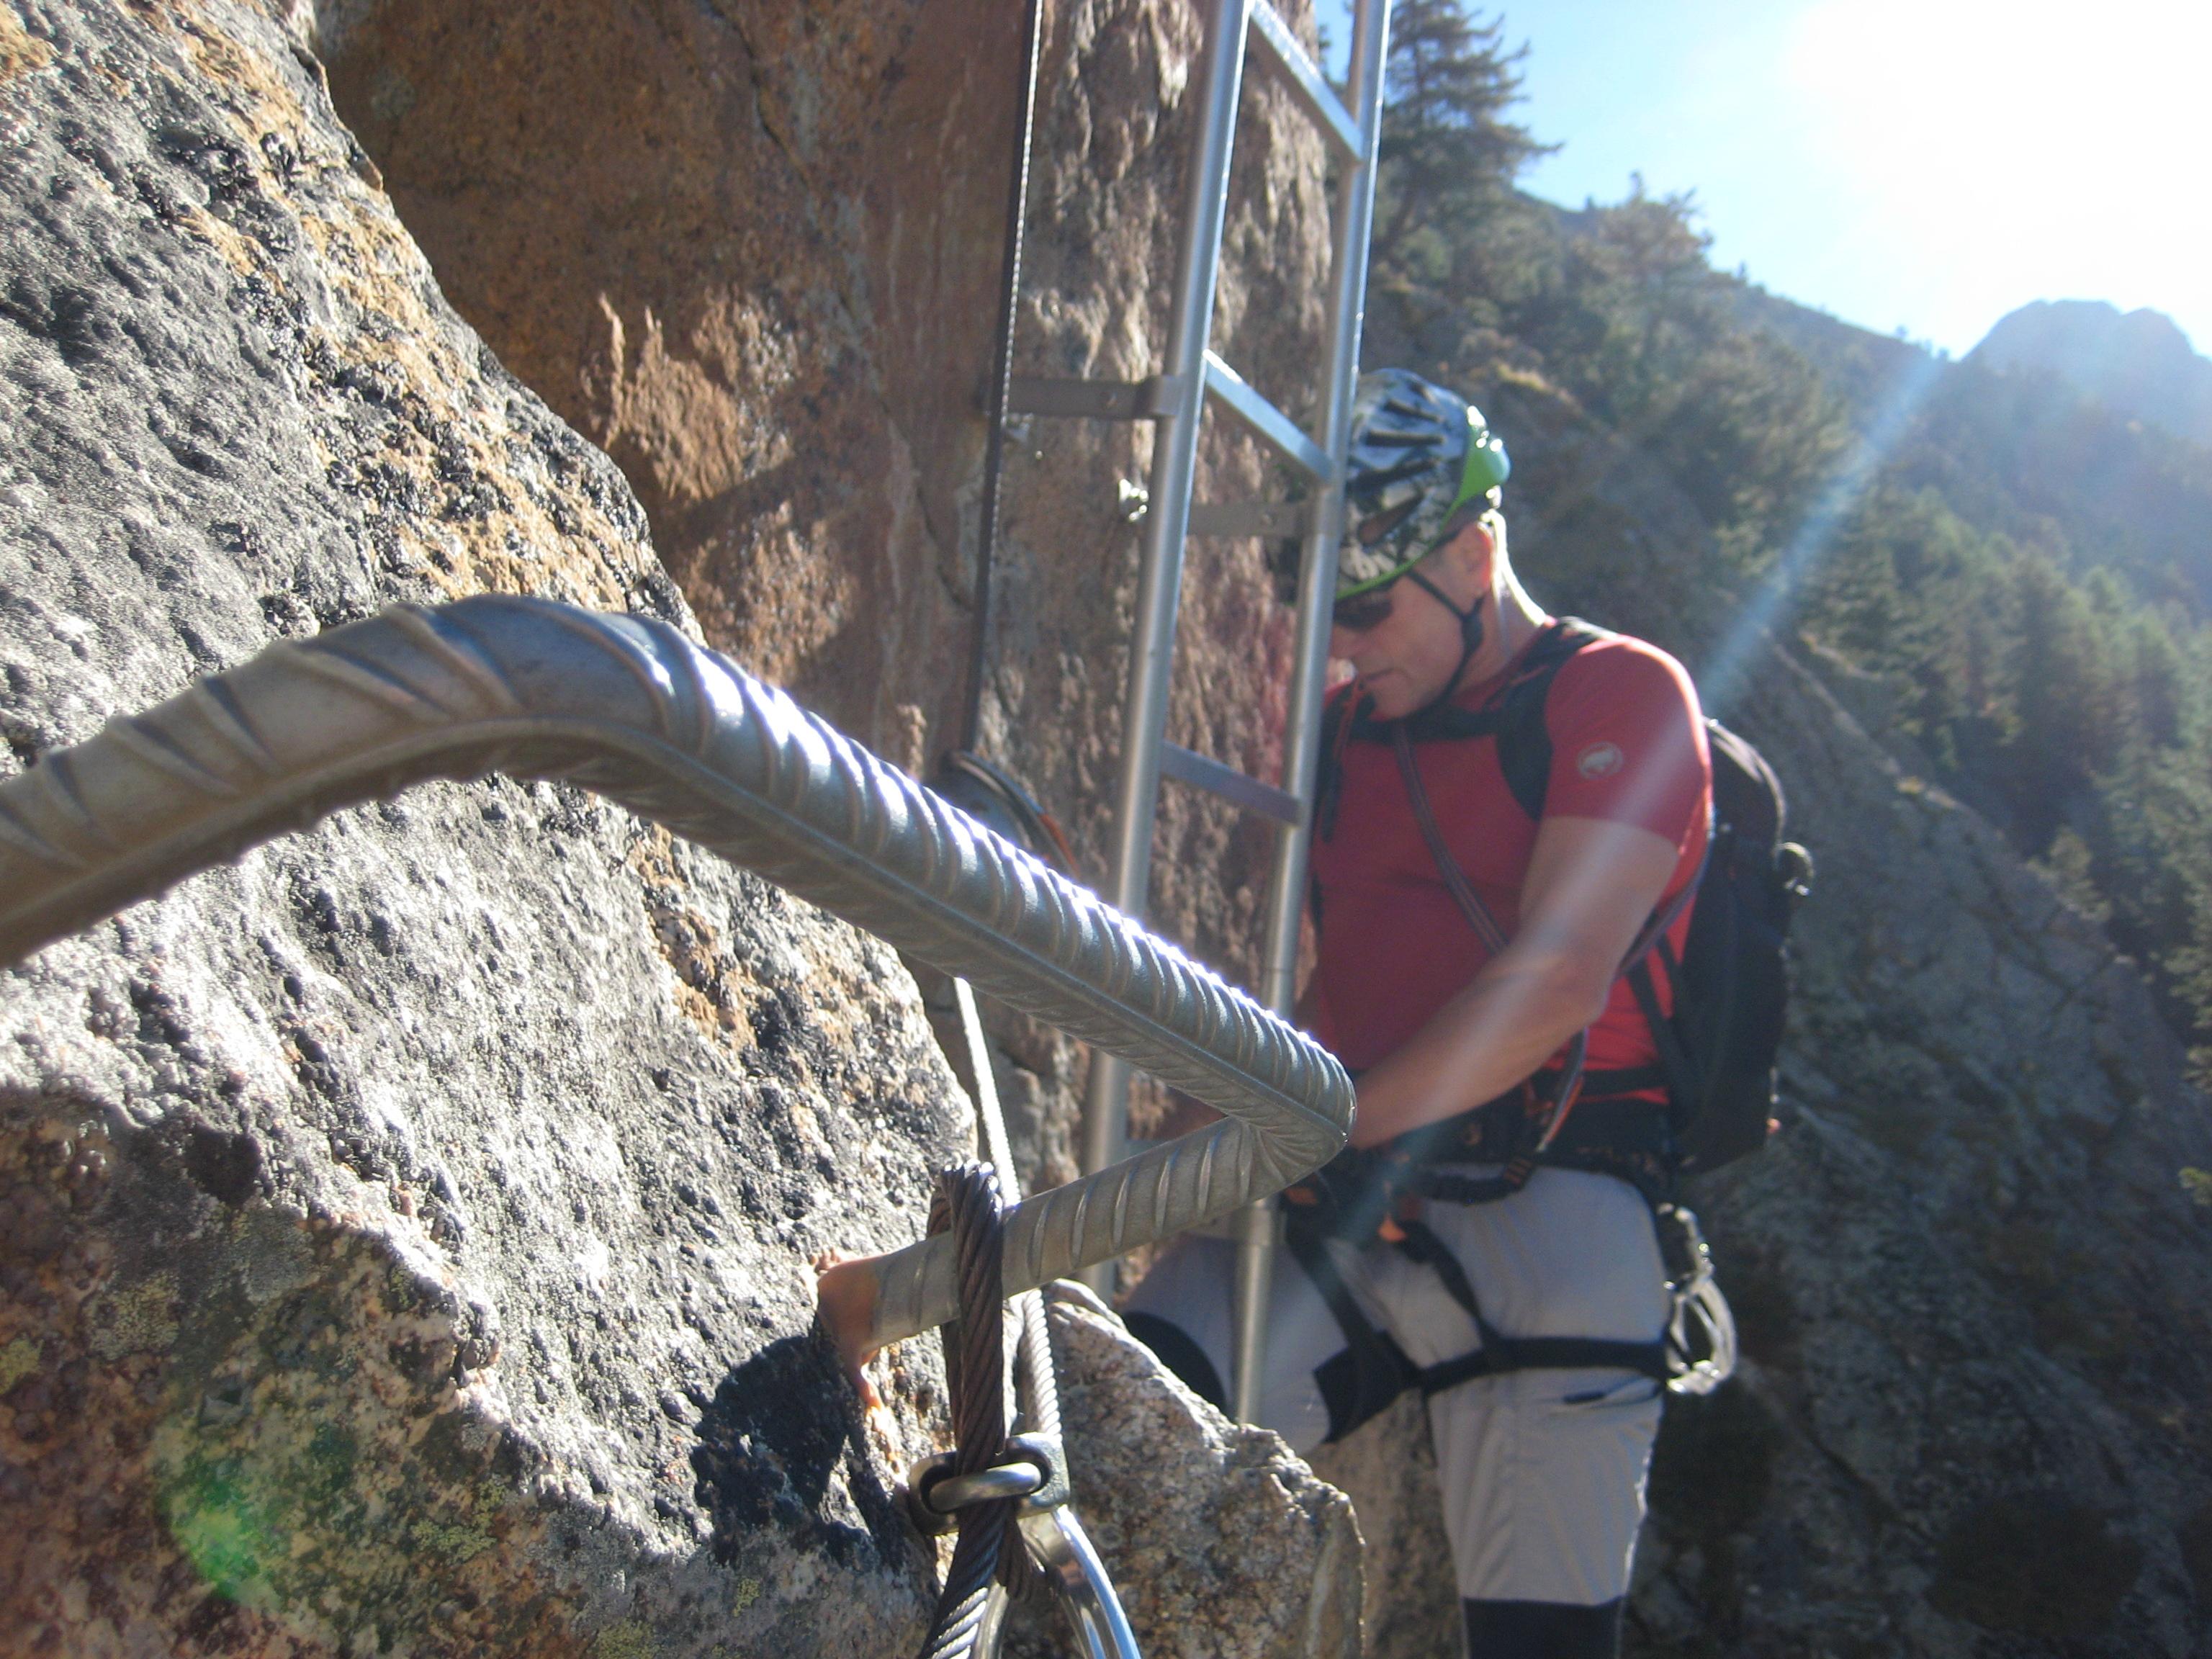 Klettersteig La Resgia : Klettersteig la resgia bergsteigen